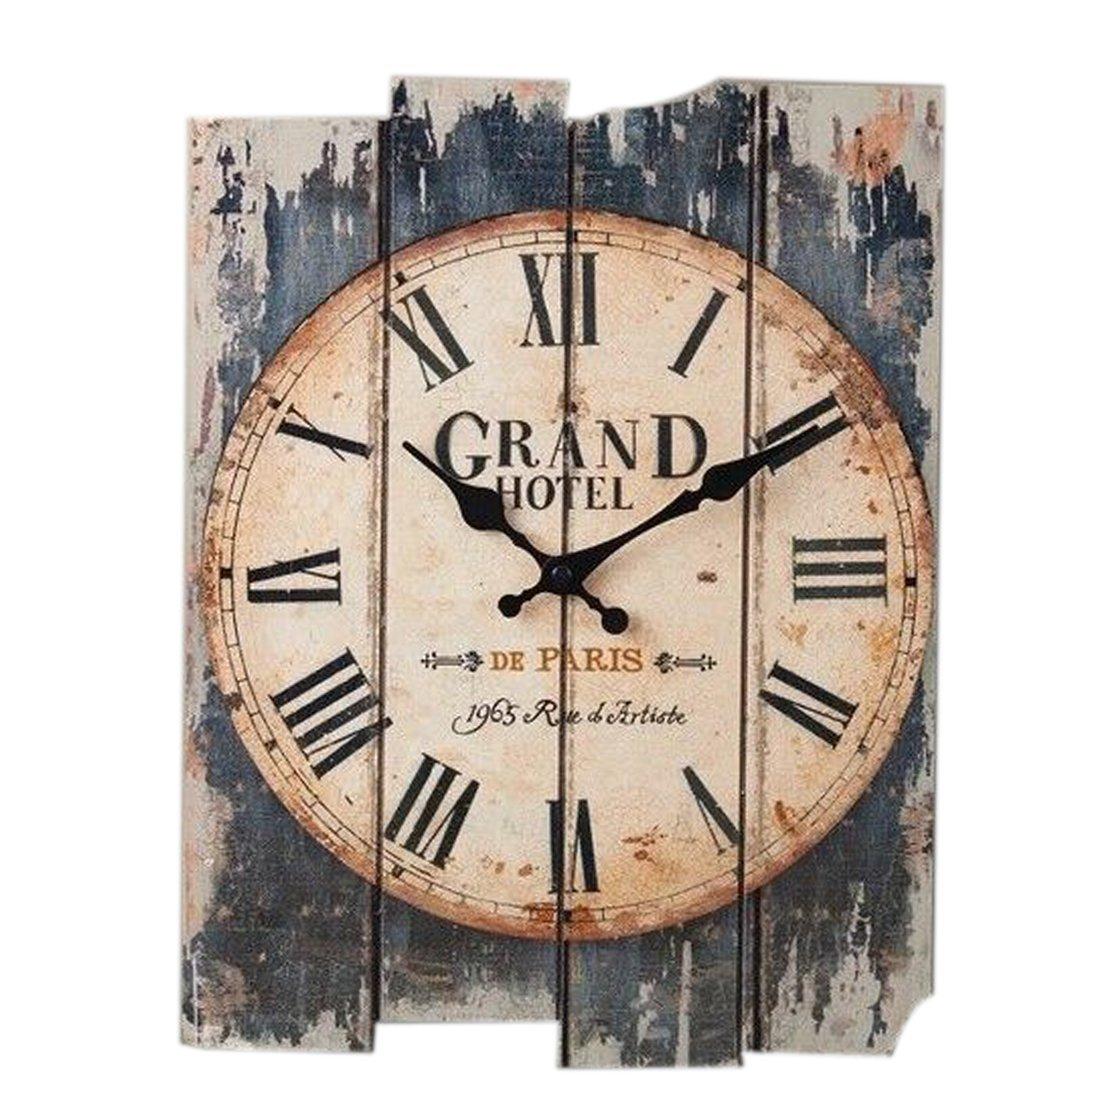 Wall Clock Vintage, Petforu 30x40cm Silent Clock Rectangle [Wooden] Roman Numeral Design - GRAND HOTEL